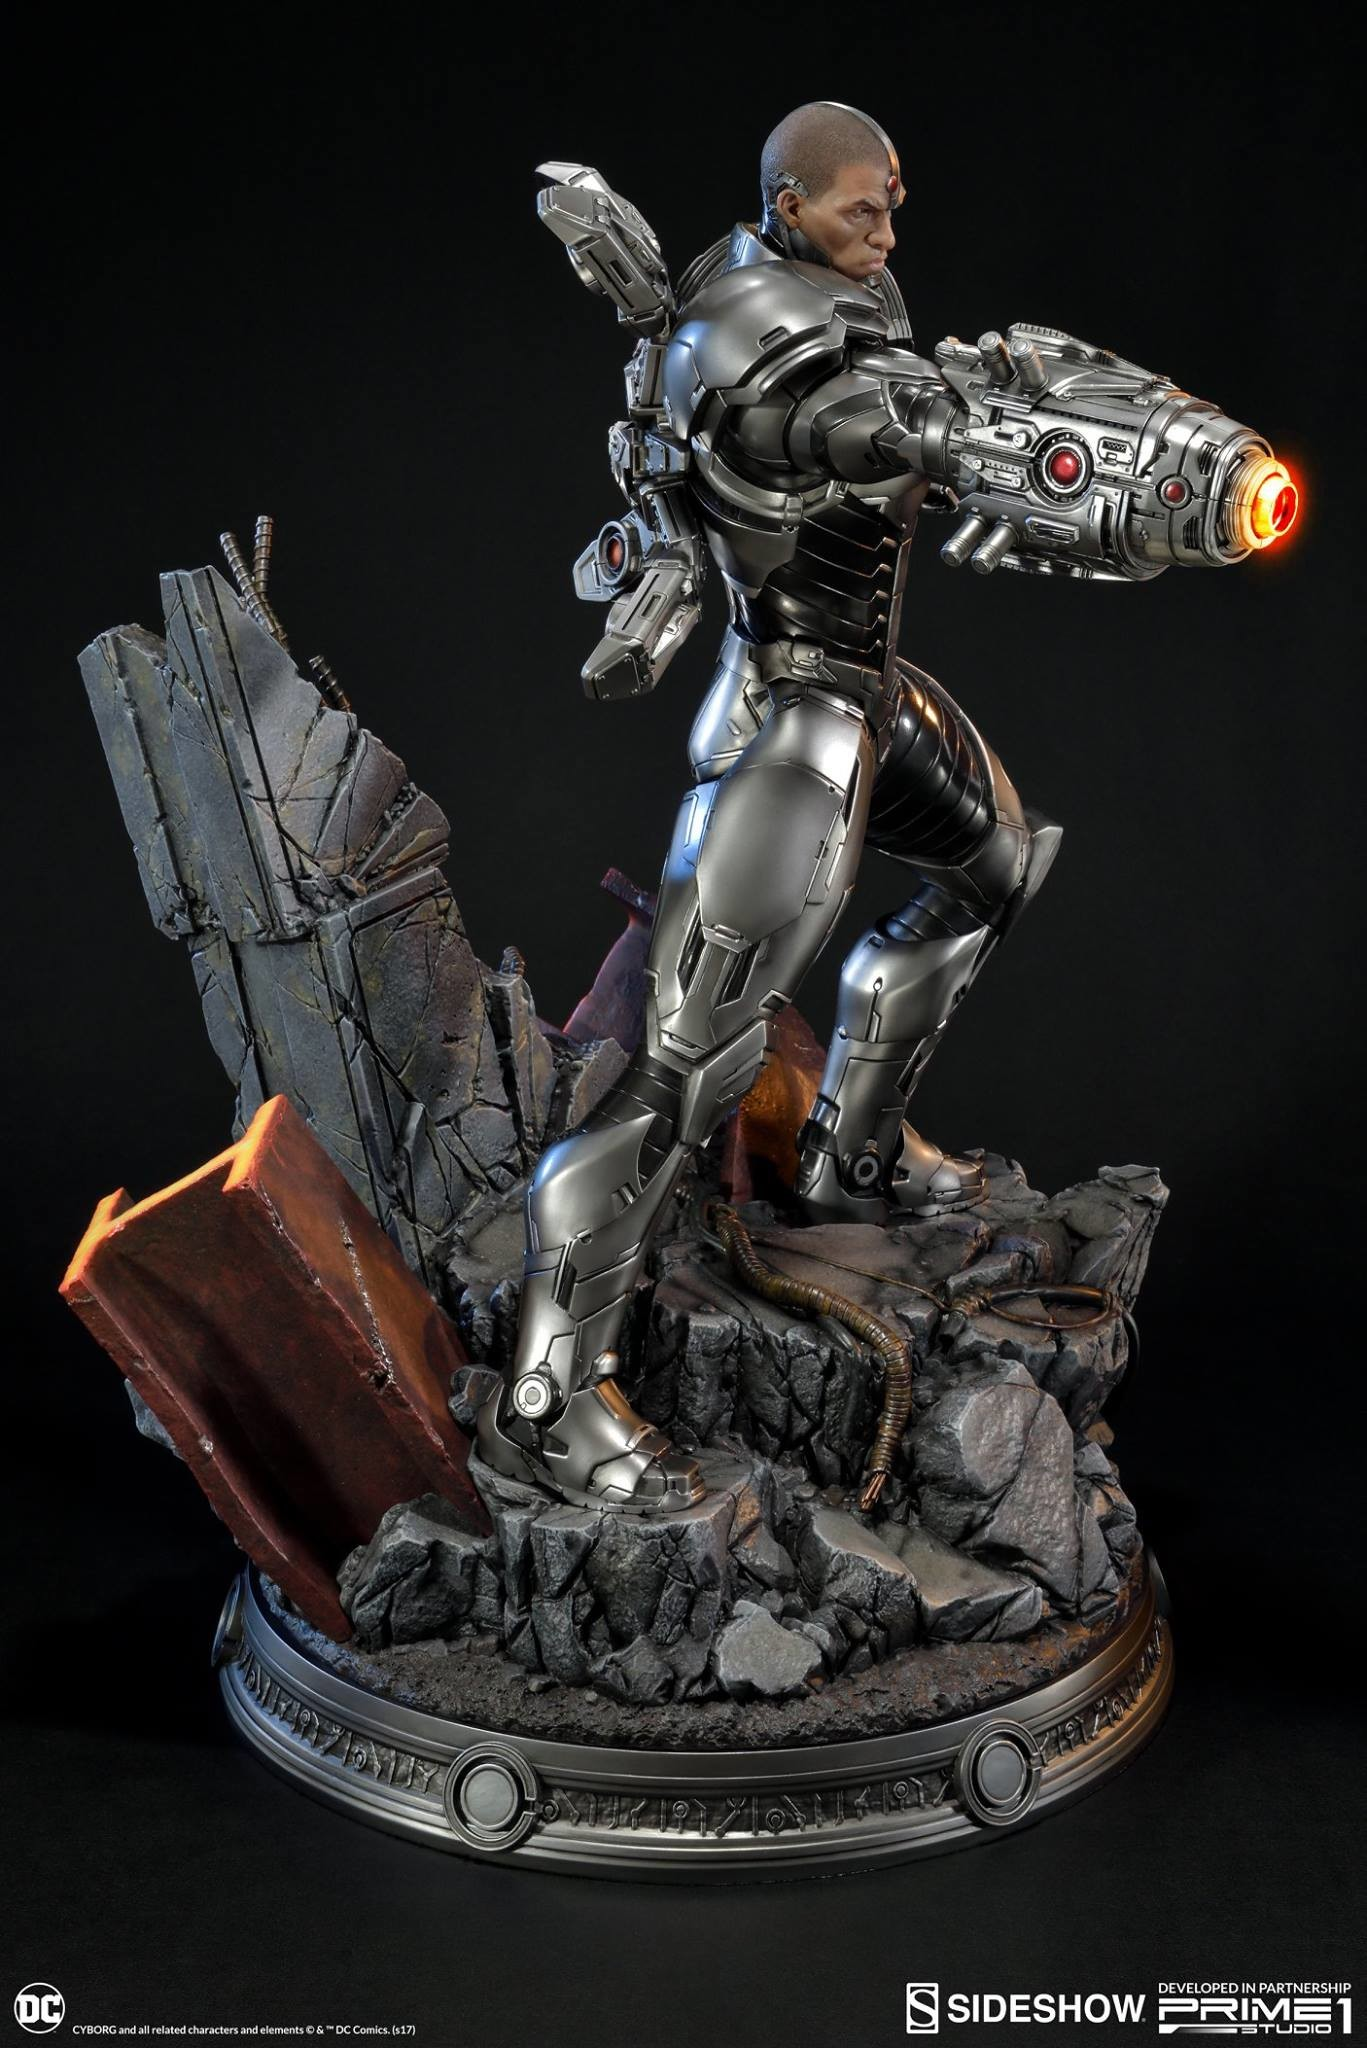 Adam fisher prime 1 studio dc cyborg statue 004